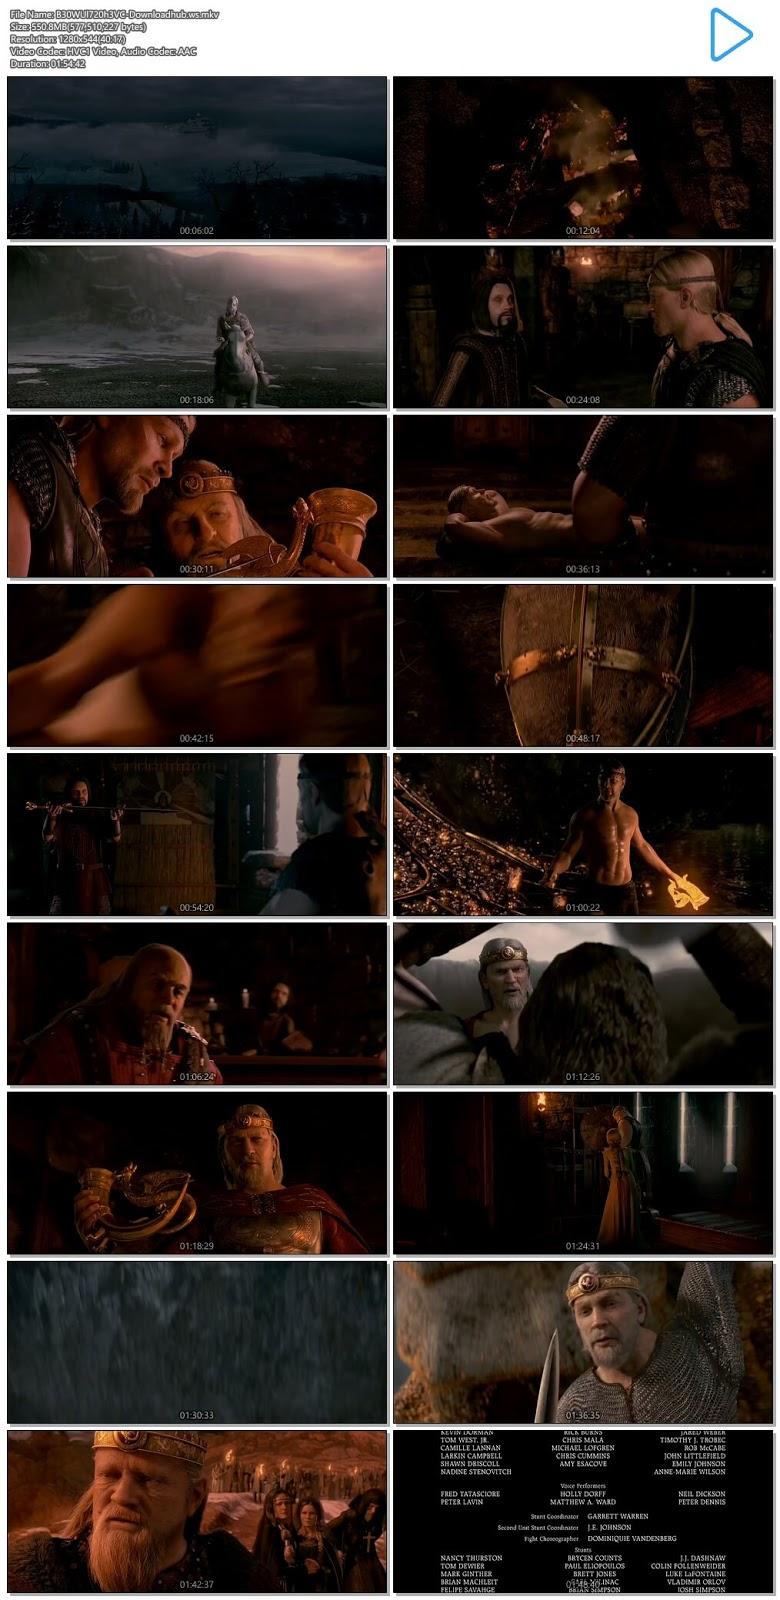 Beowulf 2007 Hindi Dual Audio 720p HEVC BluRay Free Download